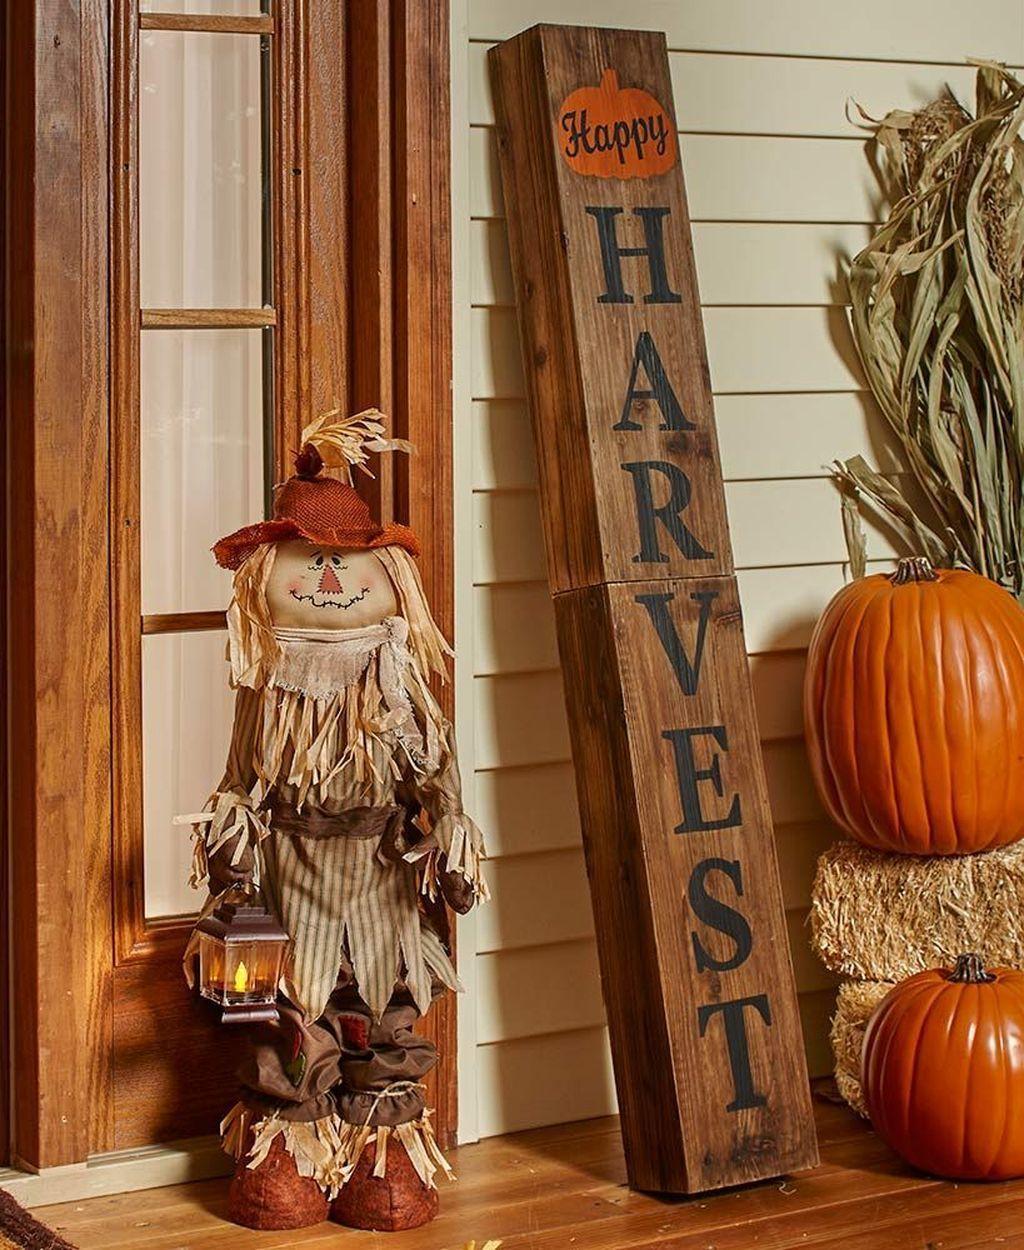 32 Lovely Outdoor Fall Decor Ideas Searchomee Fall Outdoor Decor Fall Decorations Porch Fall Decor Diy